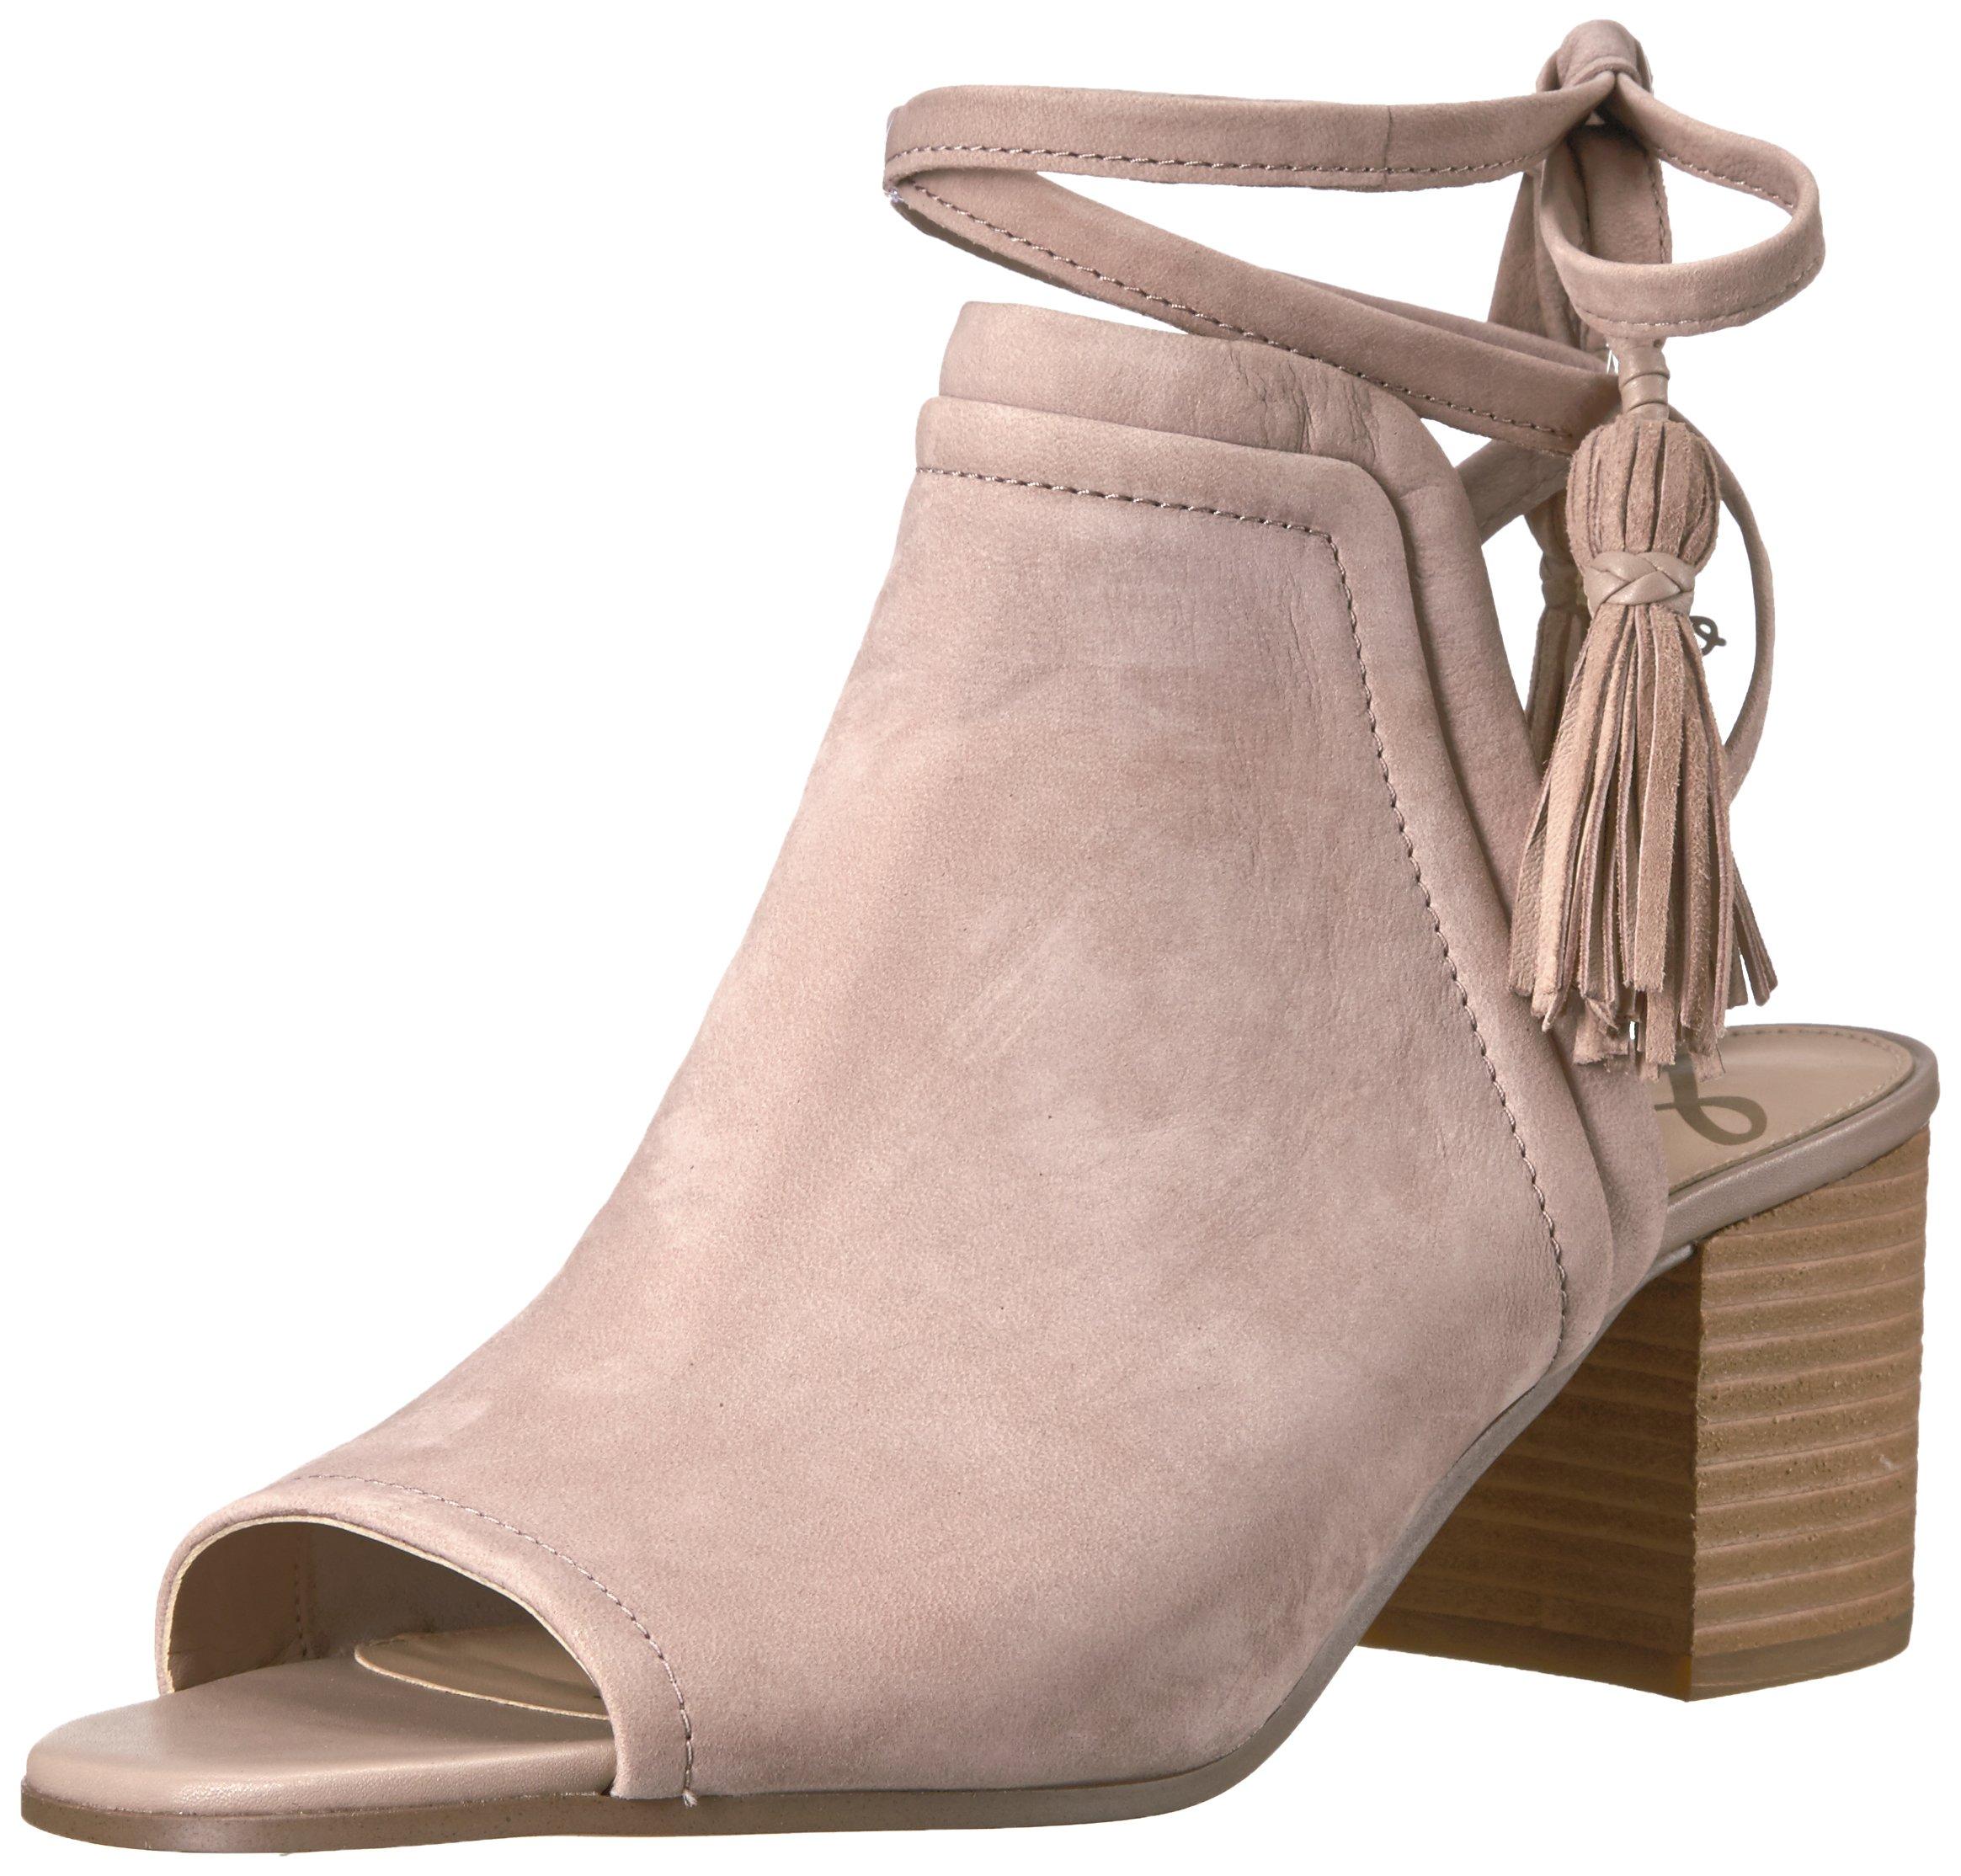 Sam Edelman Women's Sampson Heeled Sandal, Taupe Rose Suede, 8 Medium US